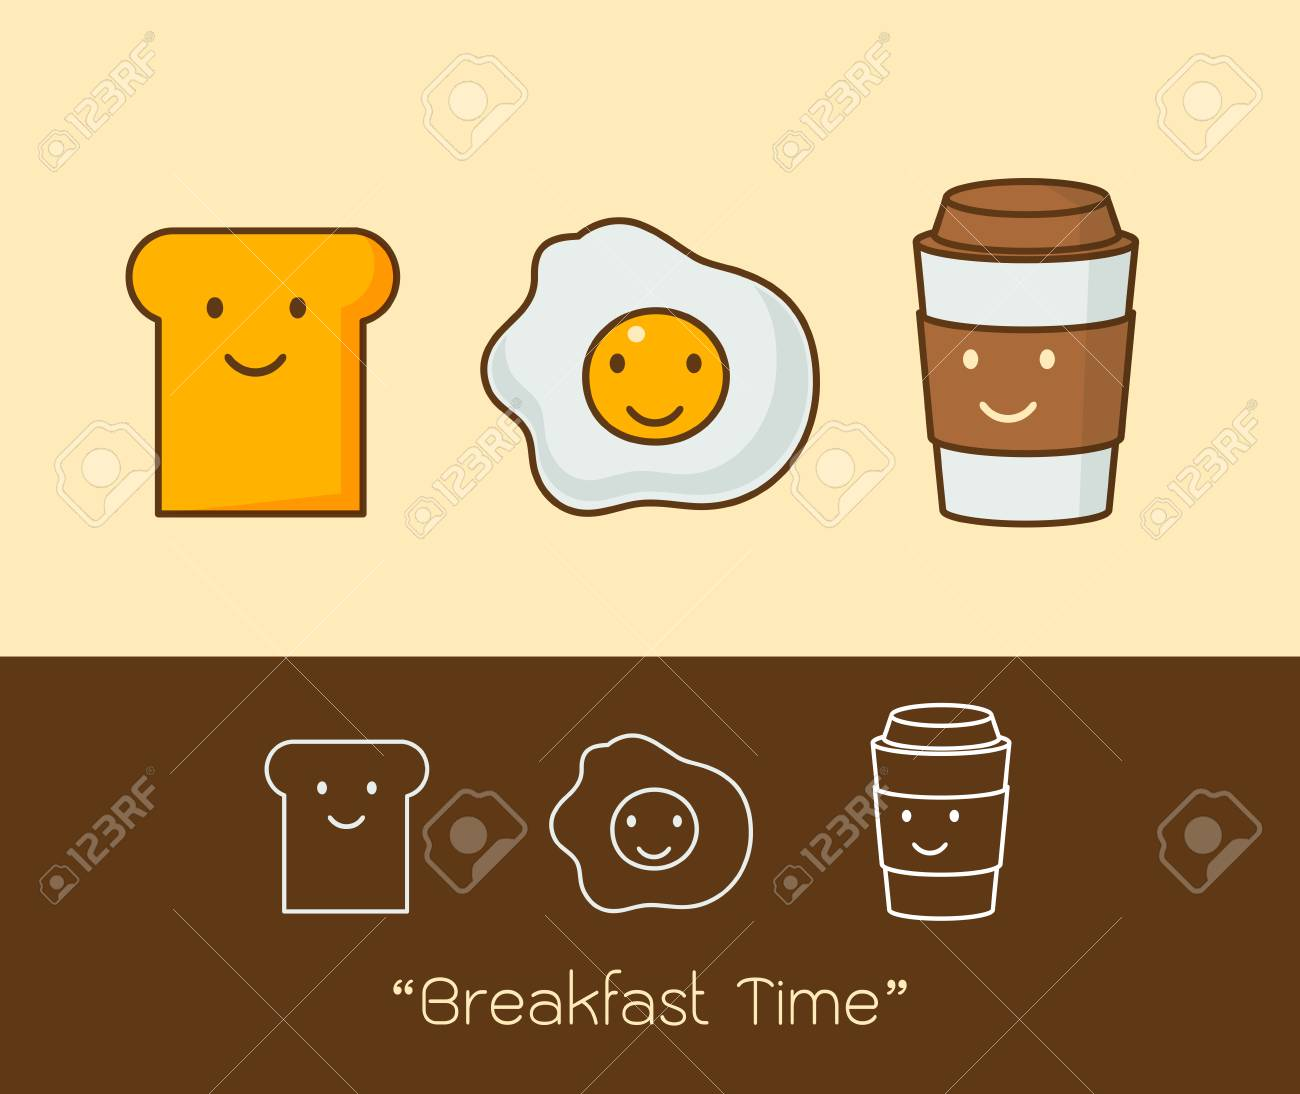 Best Friends Breakfast Good Morning Set Of Cute Picture Cartoon